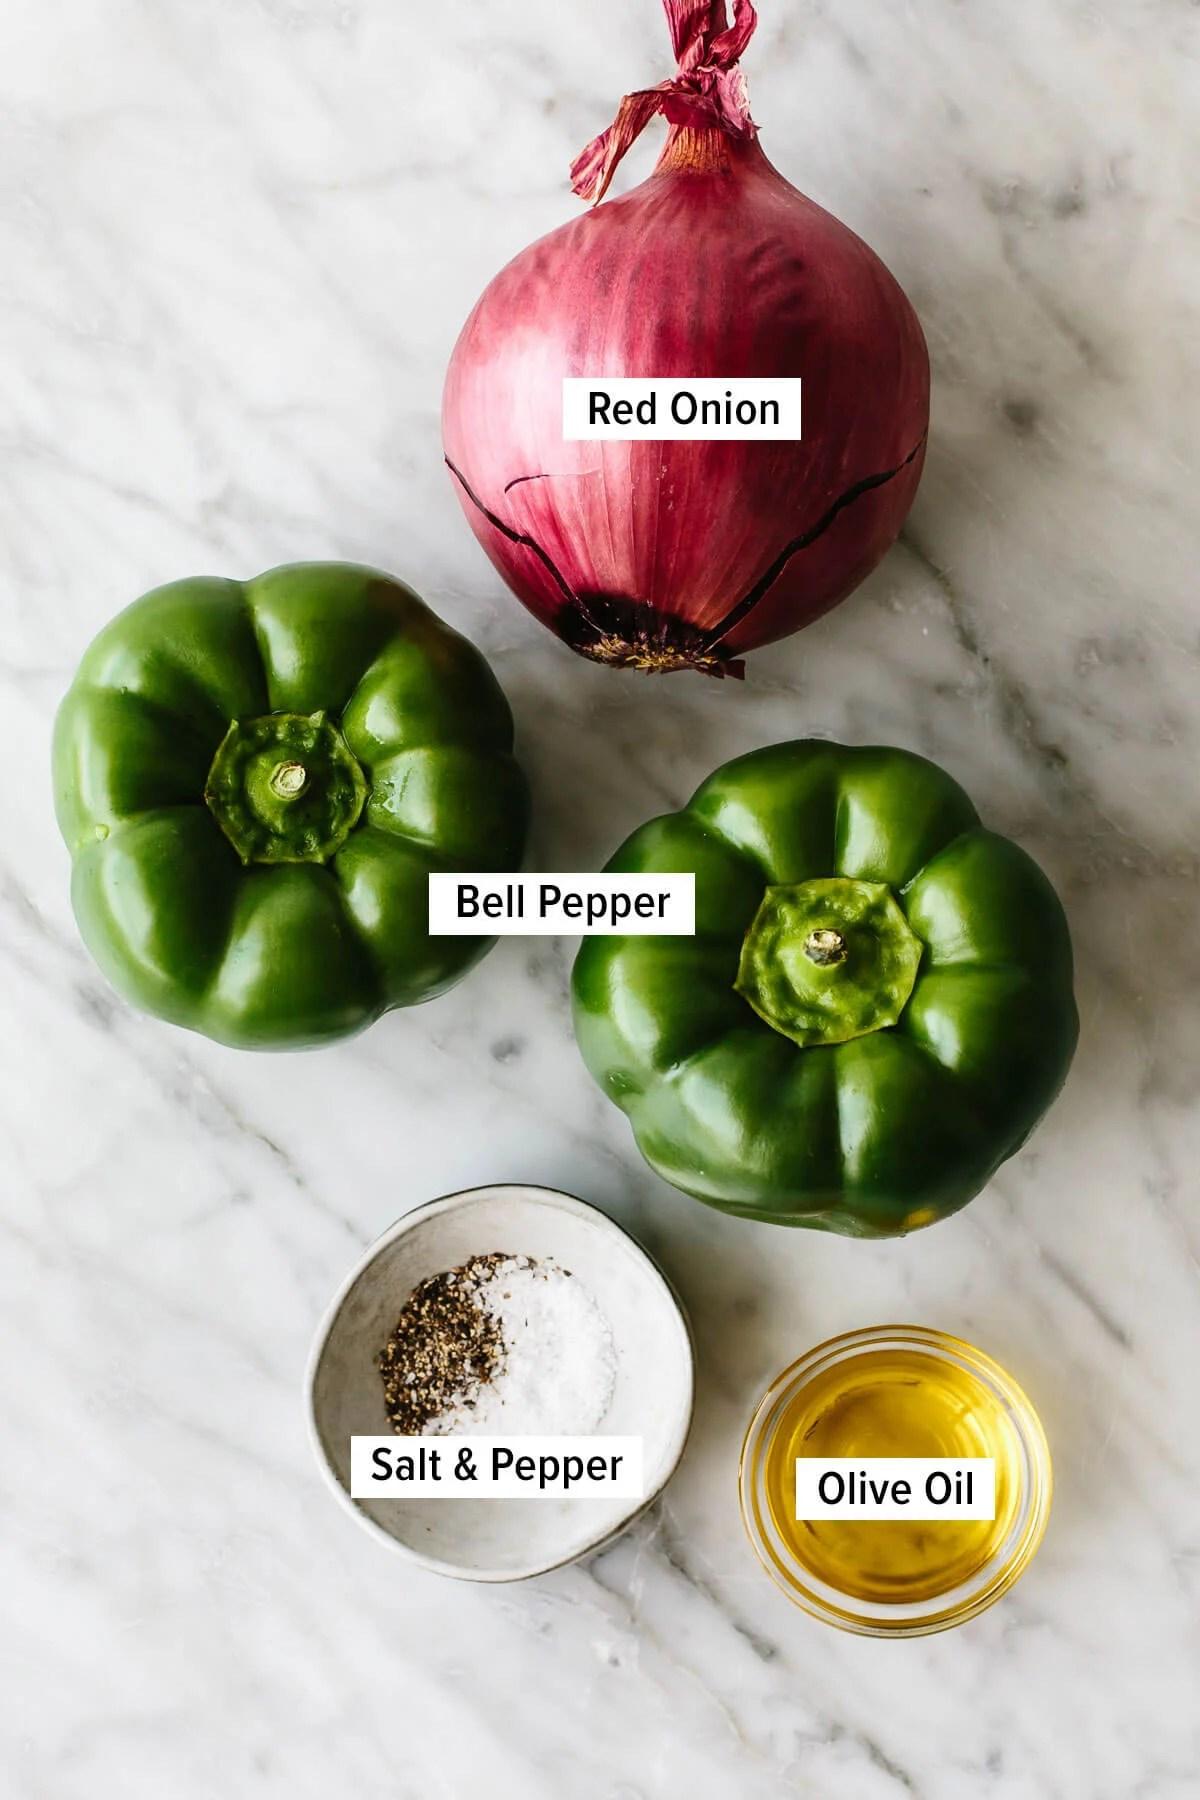 Ingredients for fajita veggies on a table.